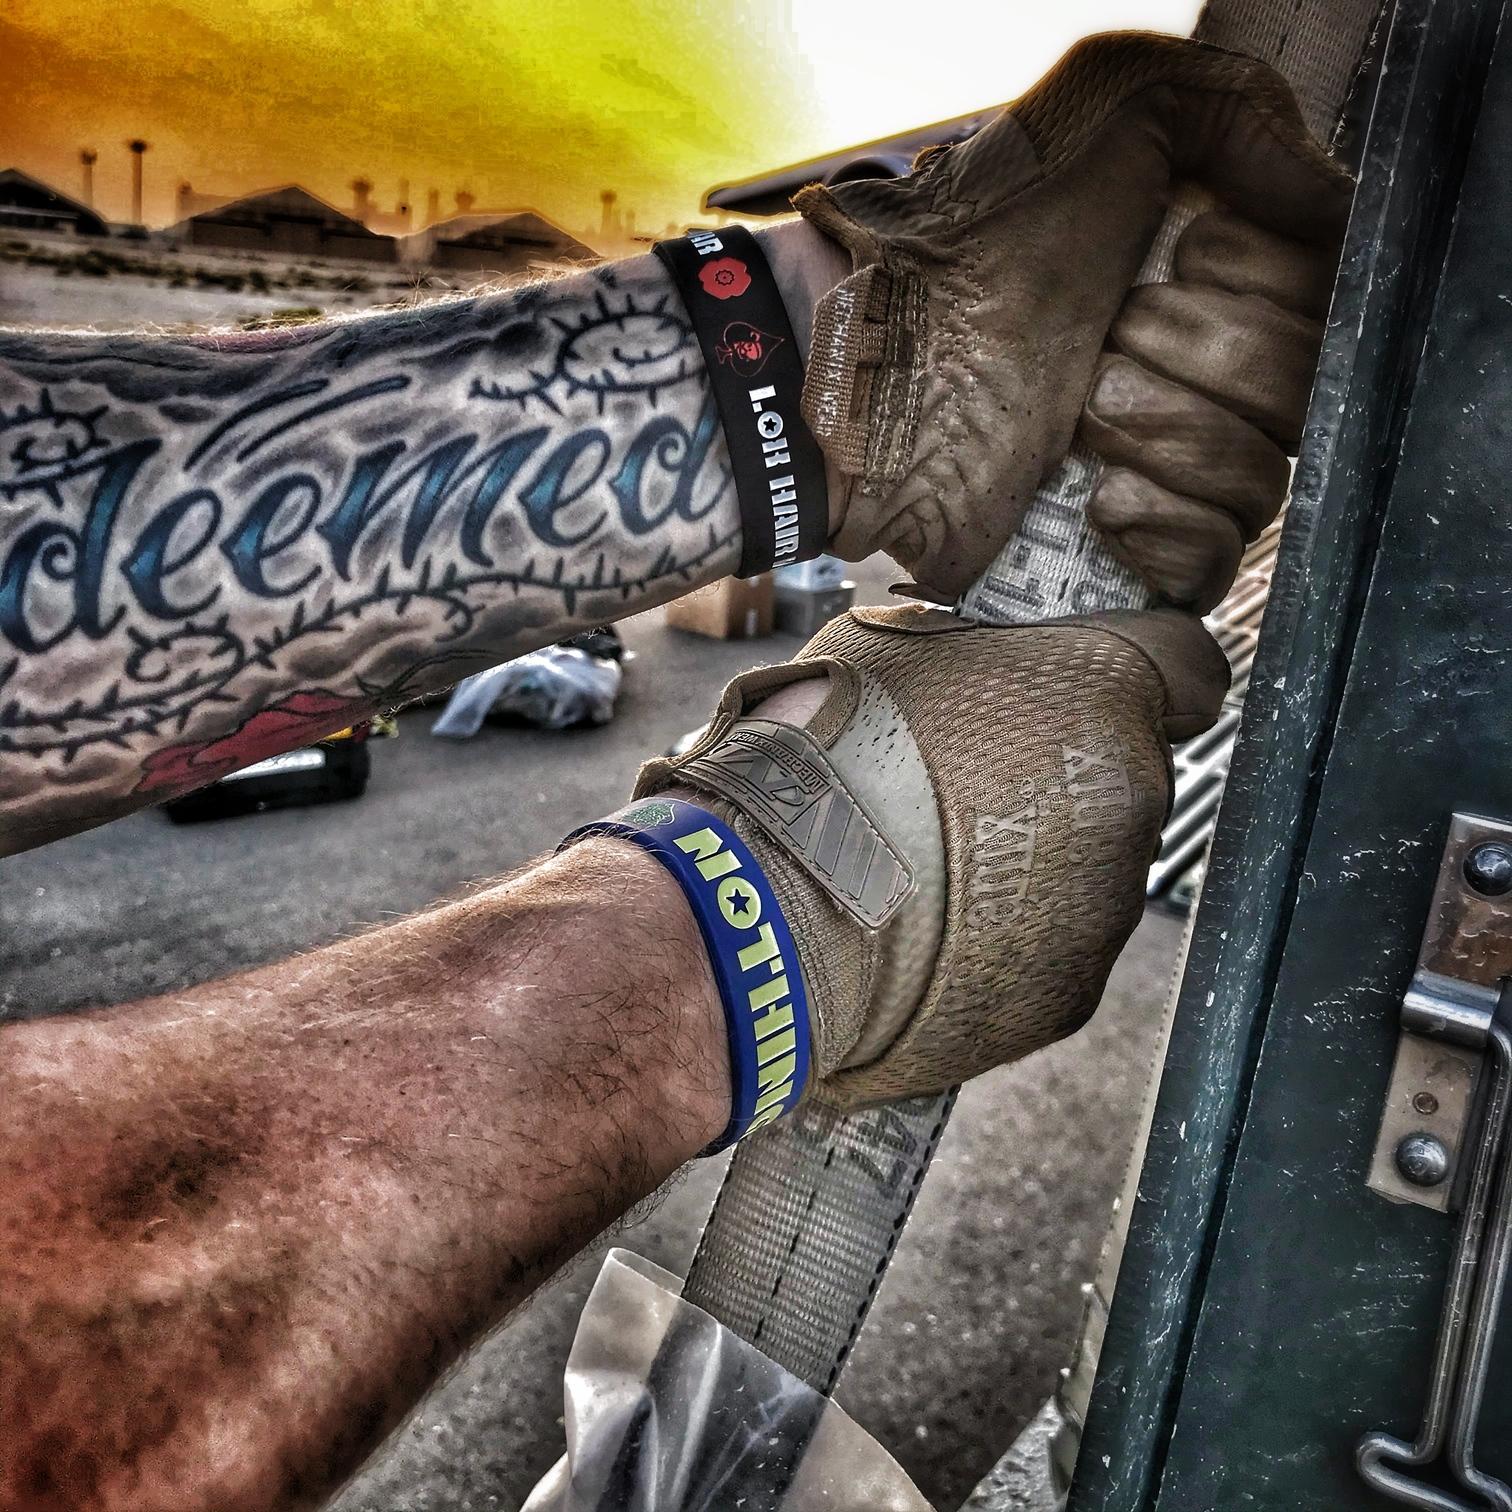 Lox Wristbands